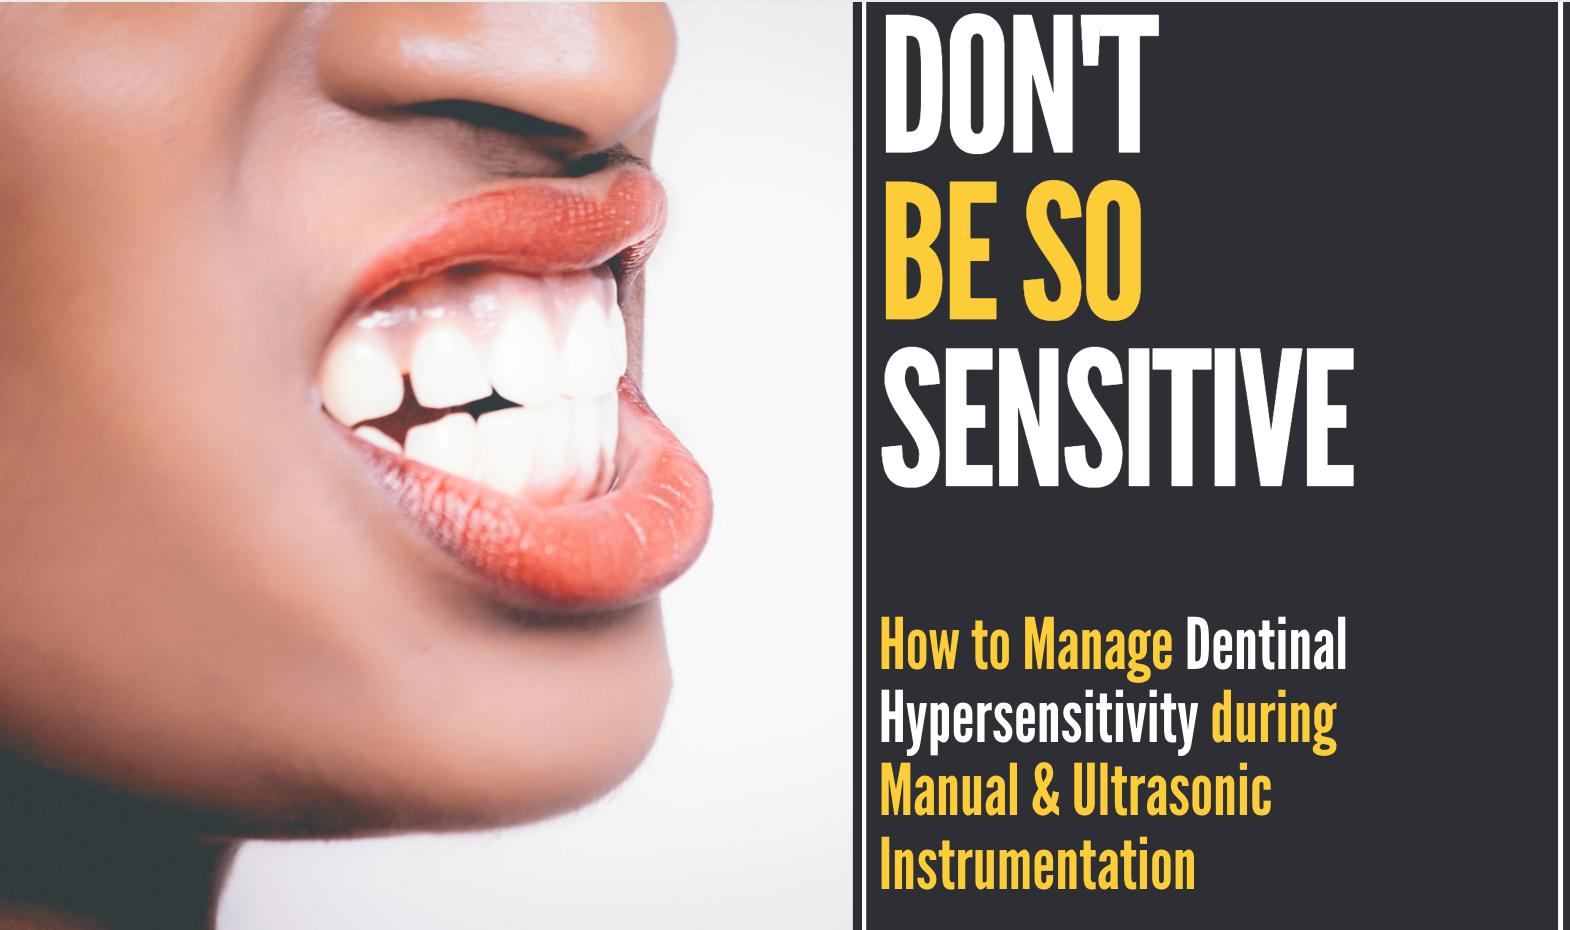 Don't Be So Sensitive: Managing Dentinal Hypersensitivity during Manual & Ultrasonic Instrumentation